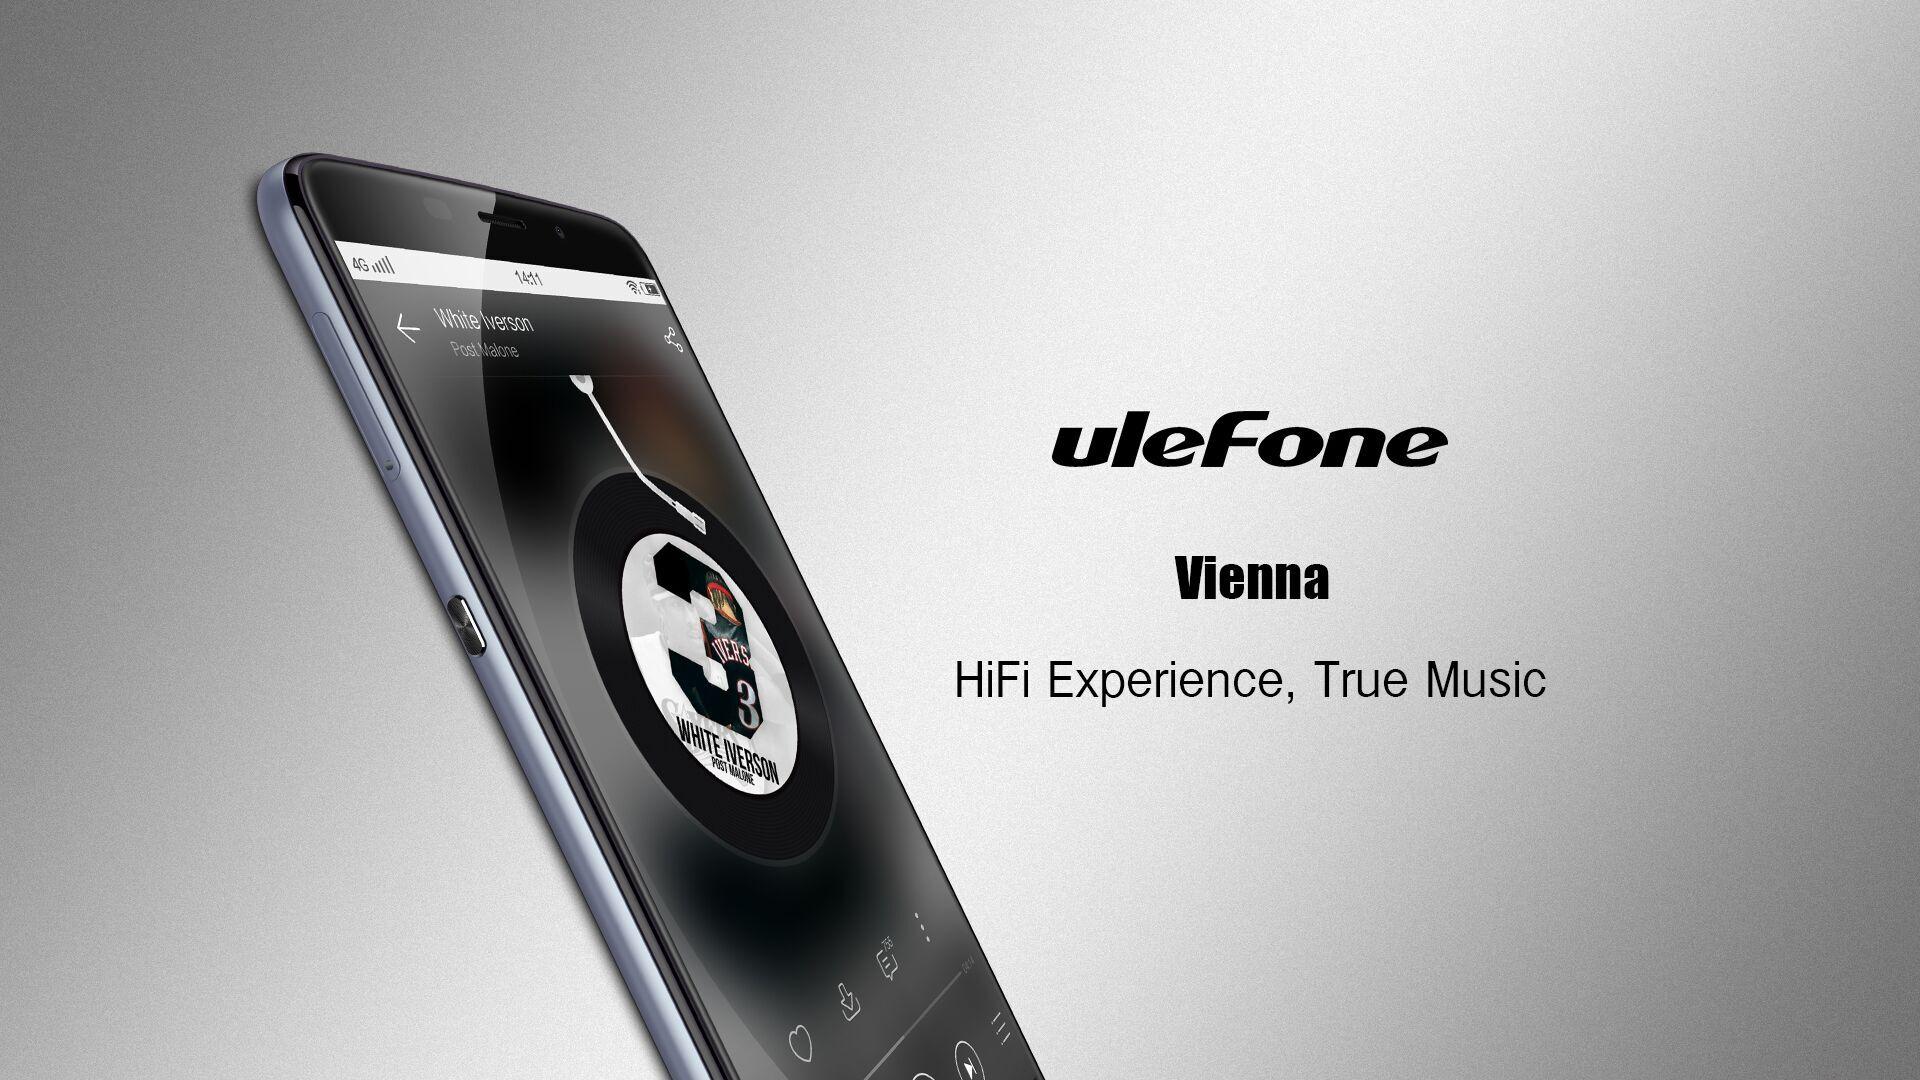 Ulefone Vienna : Concerto pour un smartphone